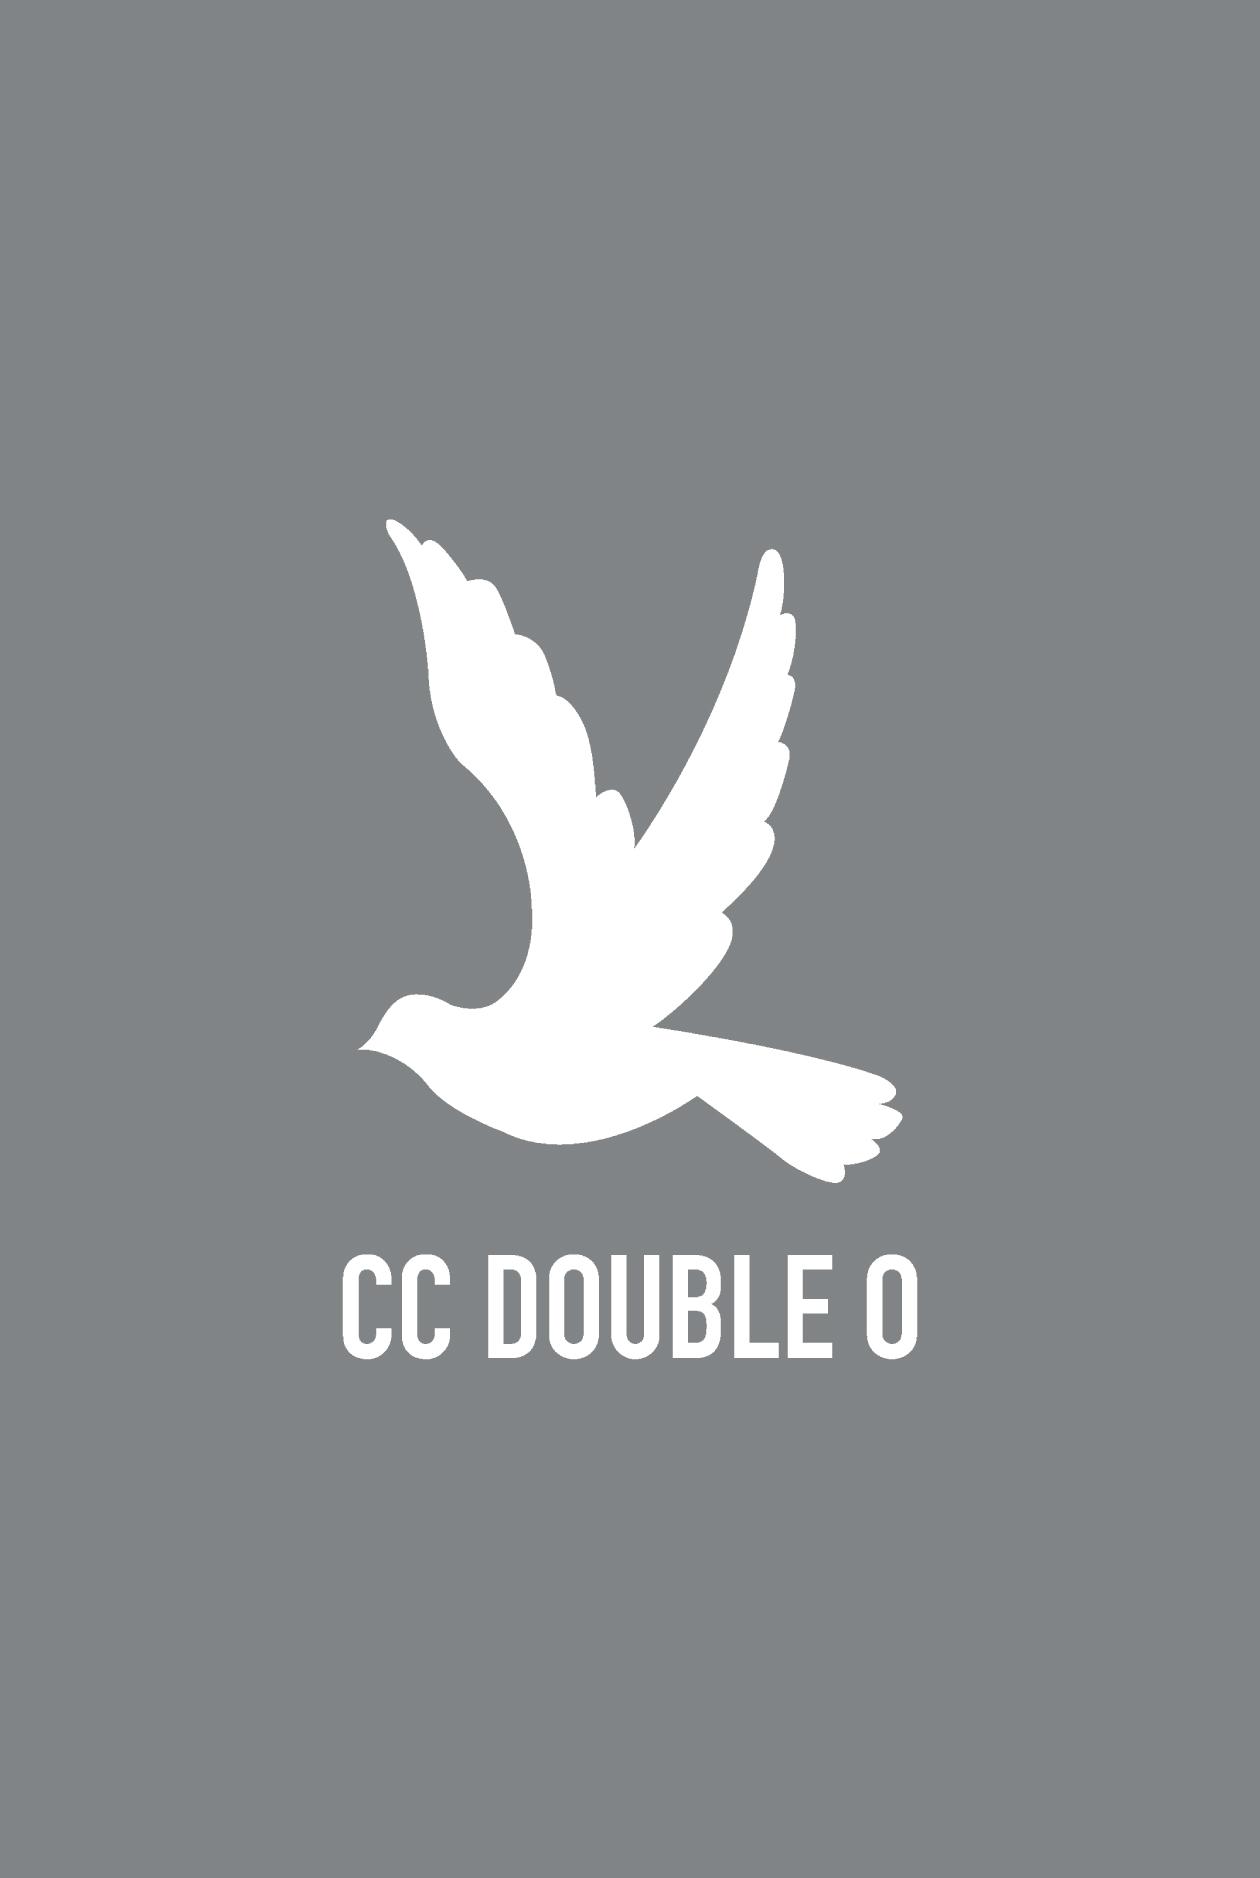 Drawstring Shorts with CC DOUBLE O logo detail